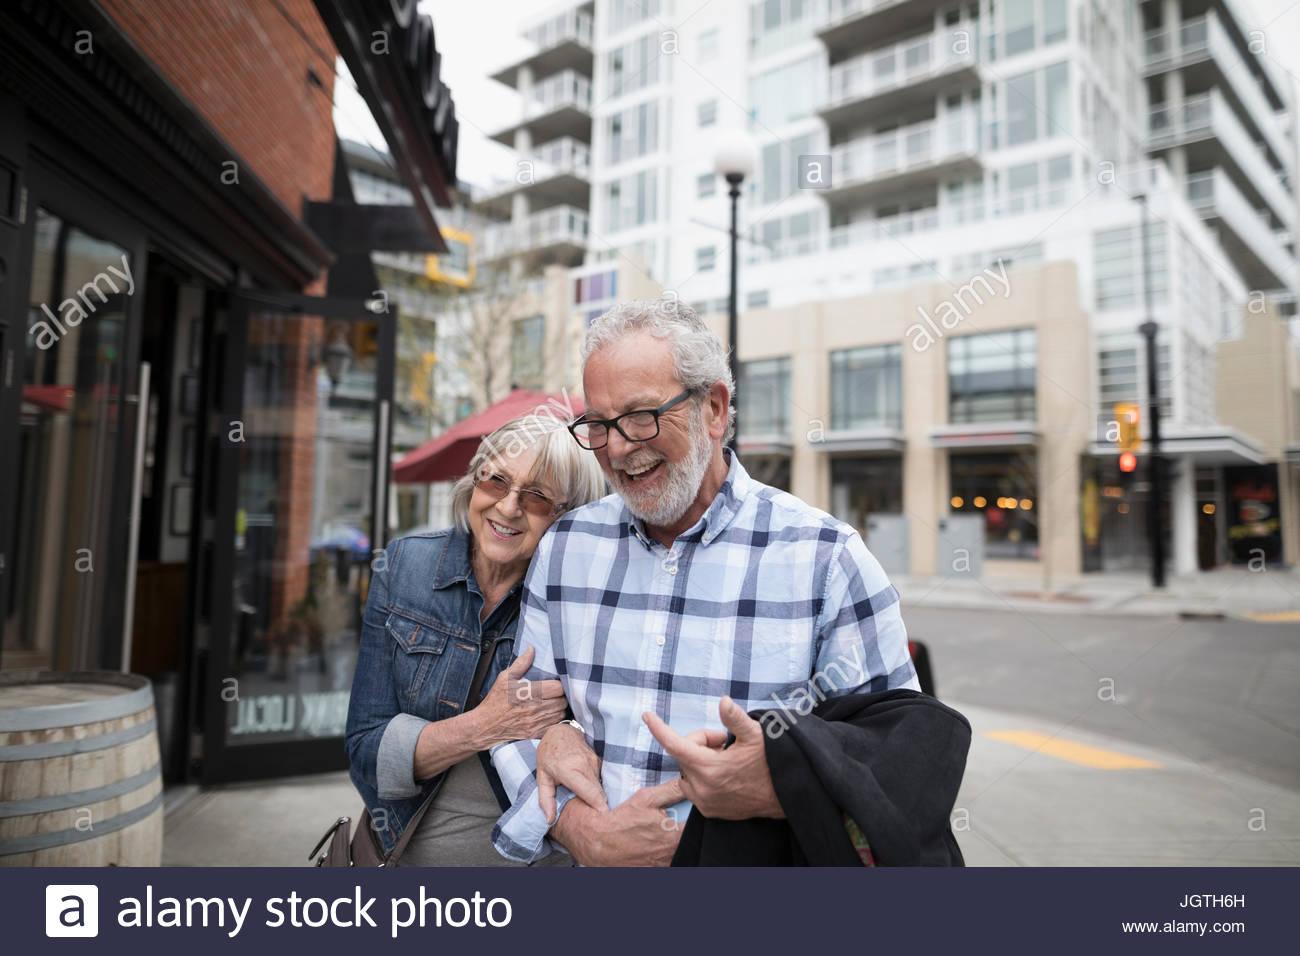 Smiling, affectionate senior couple walking on urban sidewalk - Stock Image